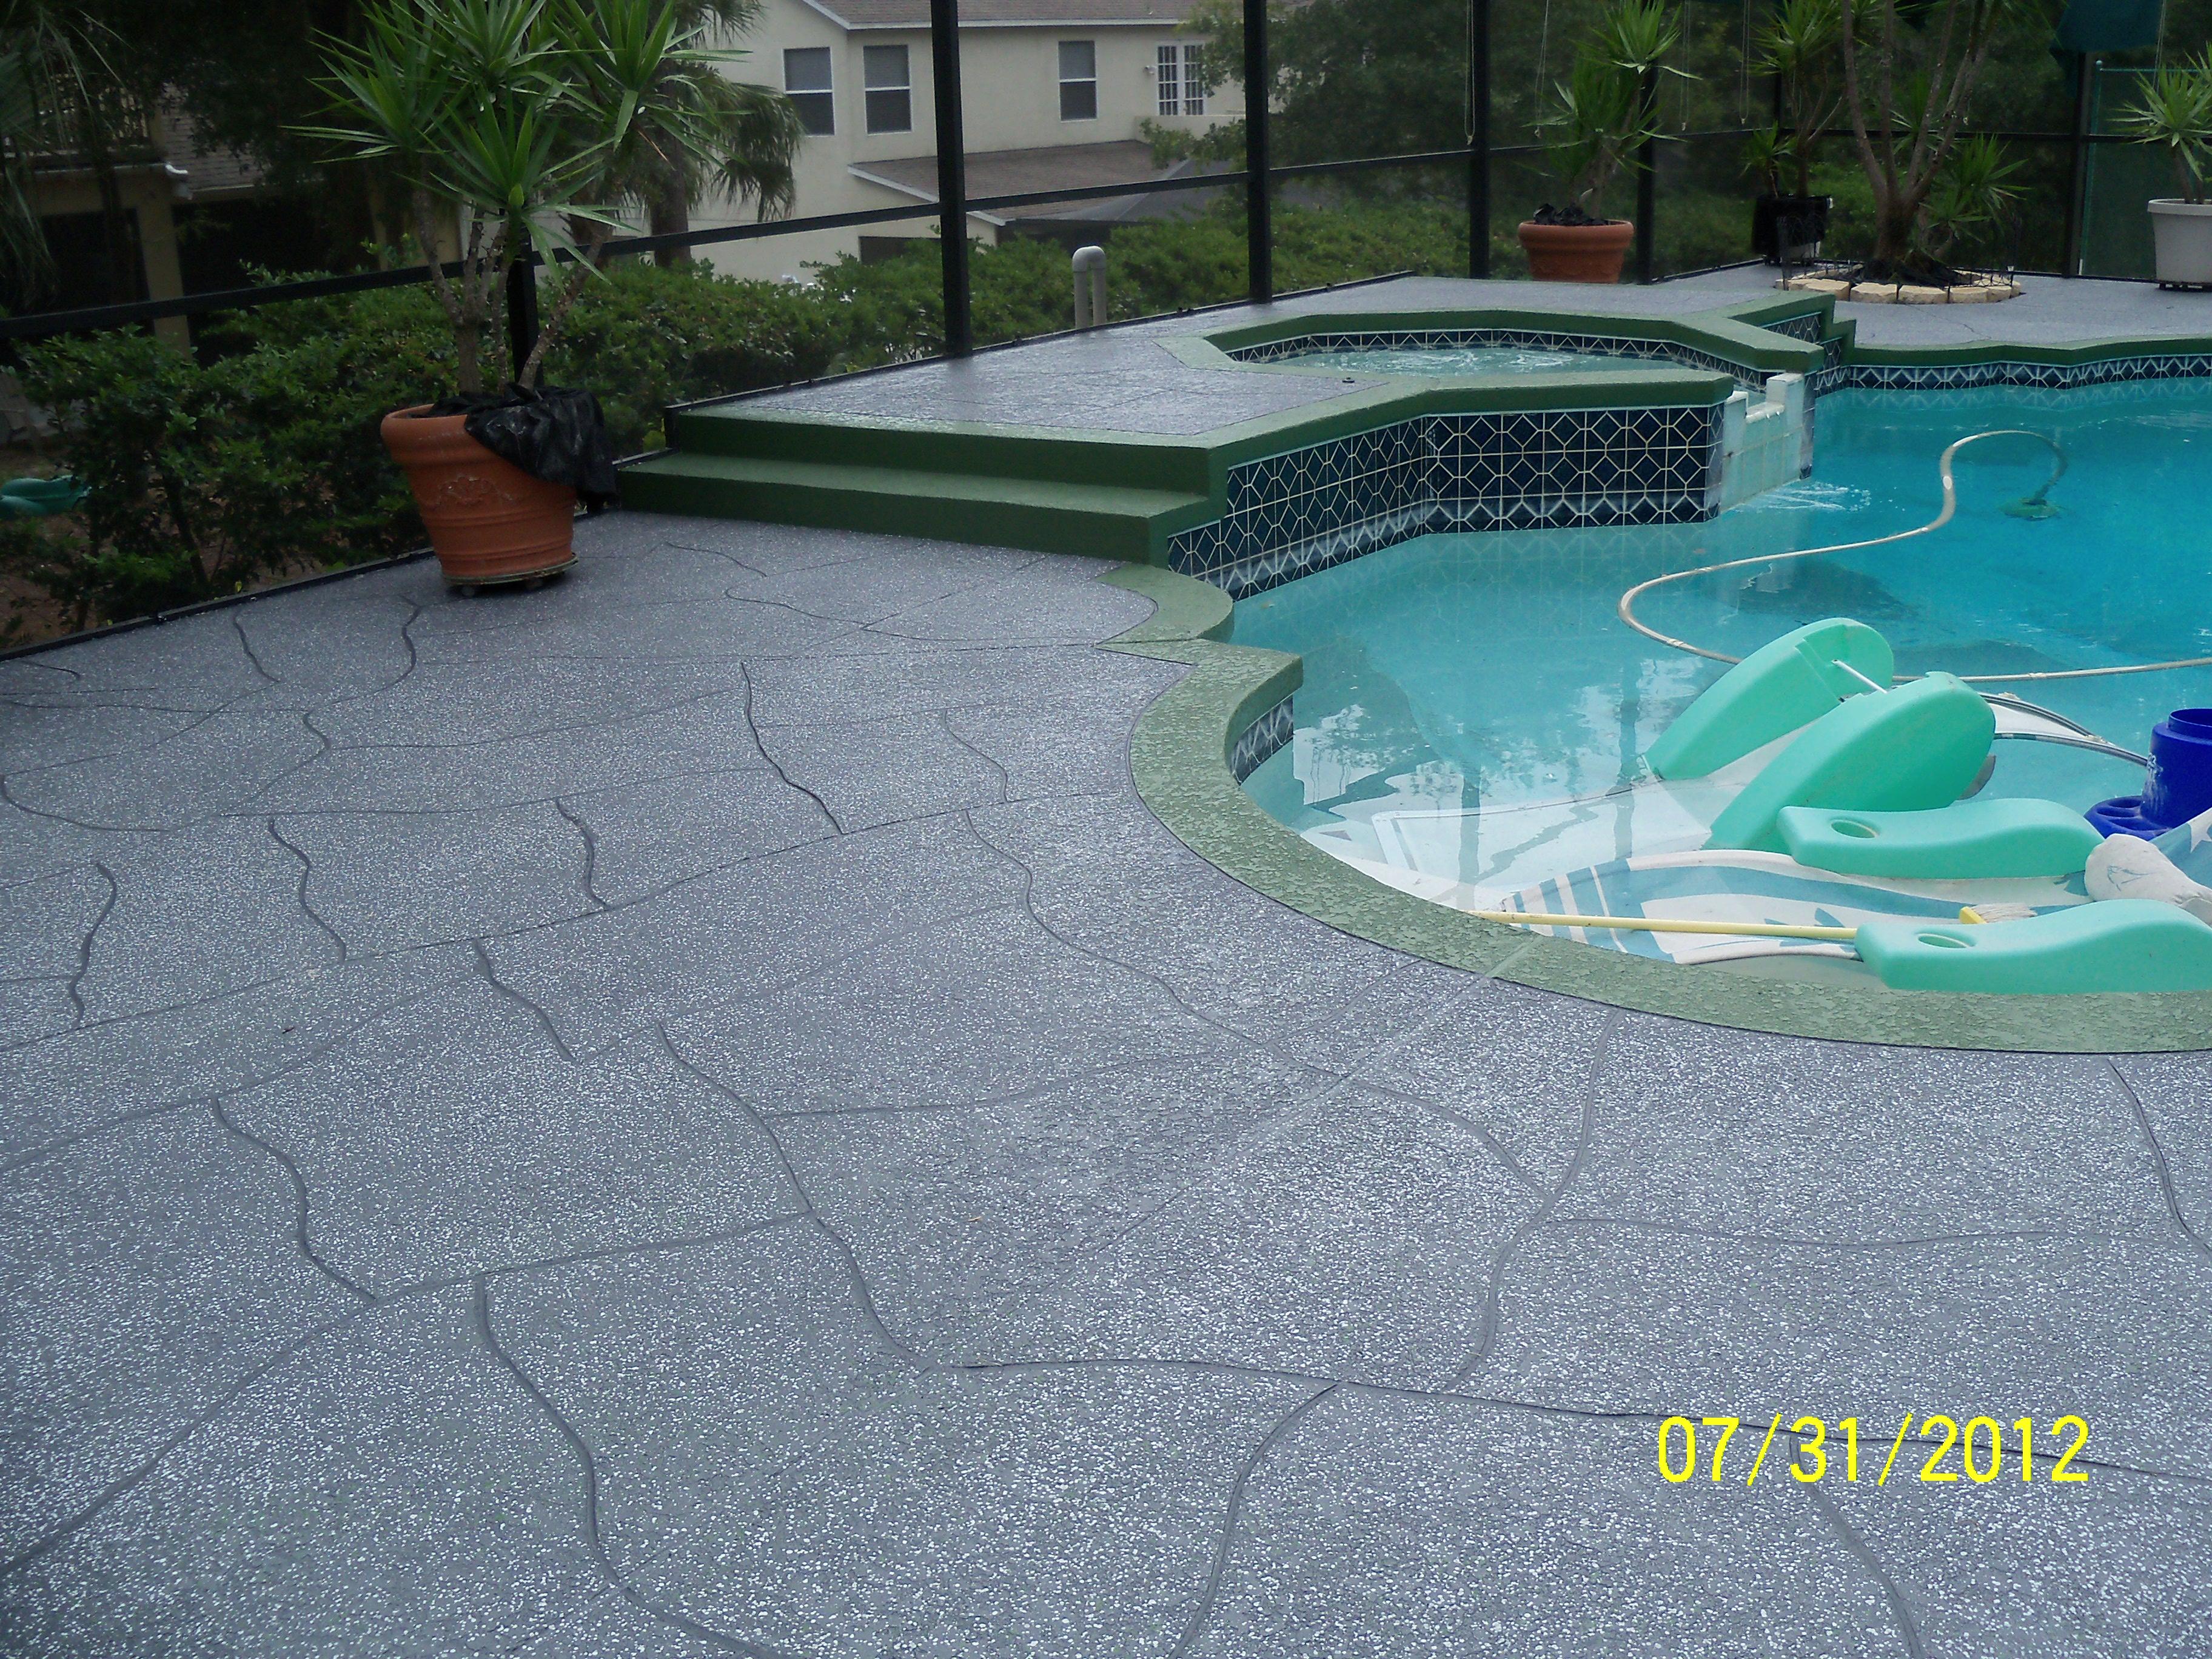 Pool Deck resurfacing remodeling pavers repair tampa pinealls pasco